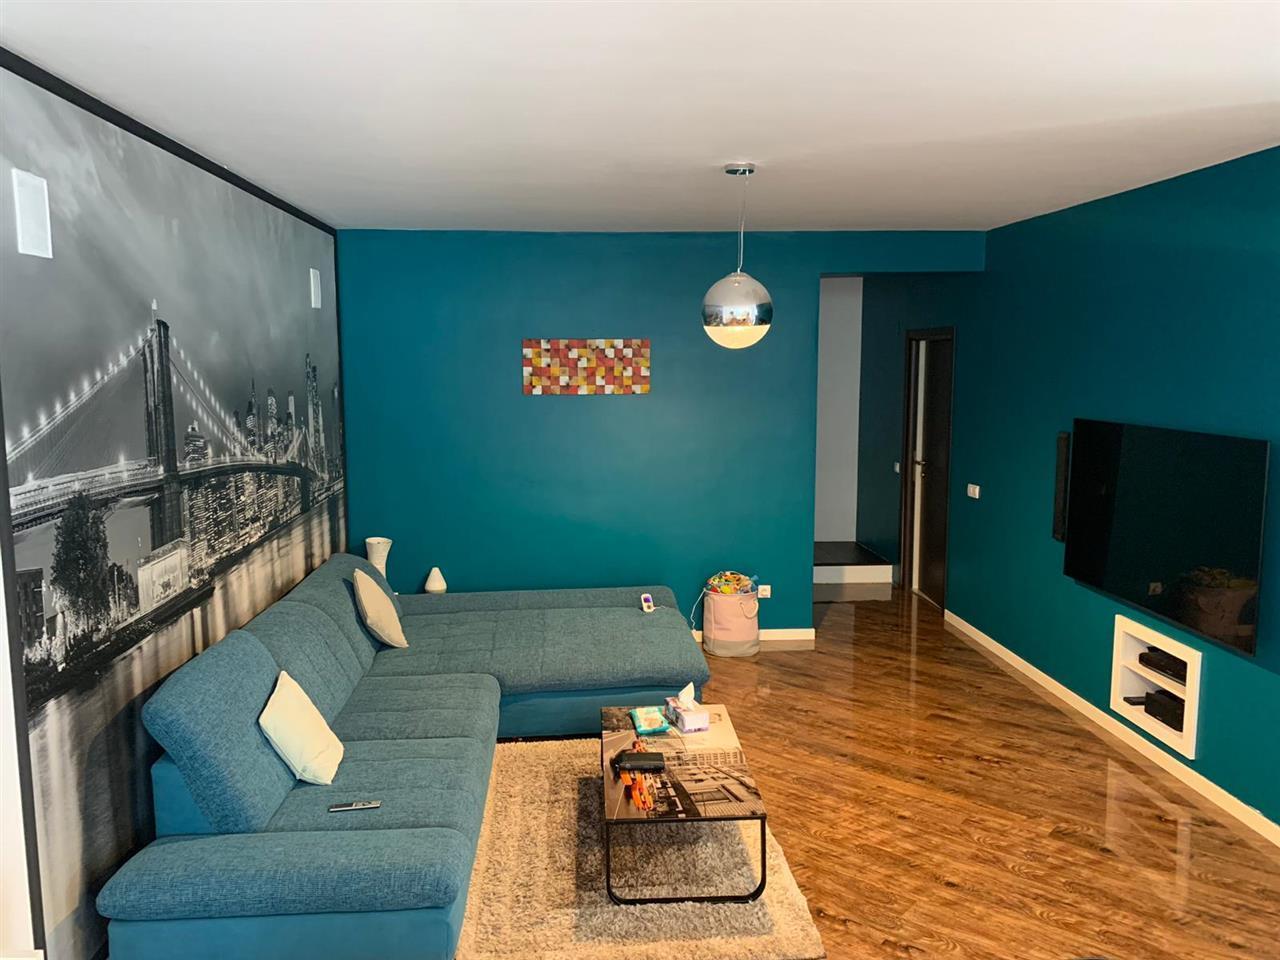 Casa 190 mp,4 camere,3 bai, mobilata/utilata la cheie